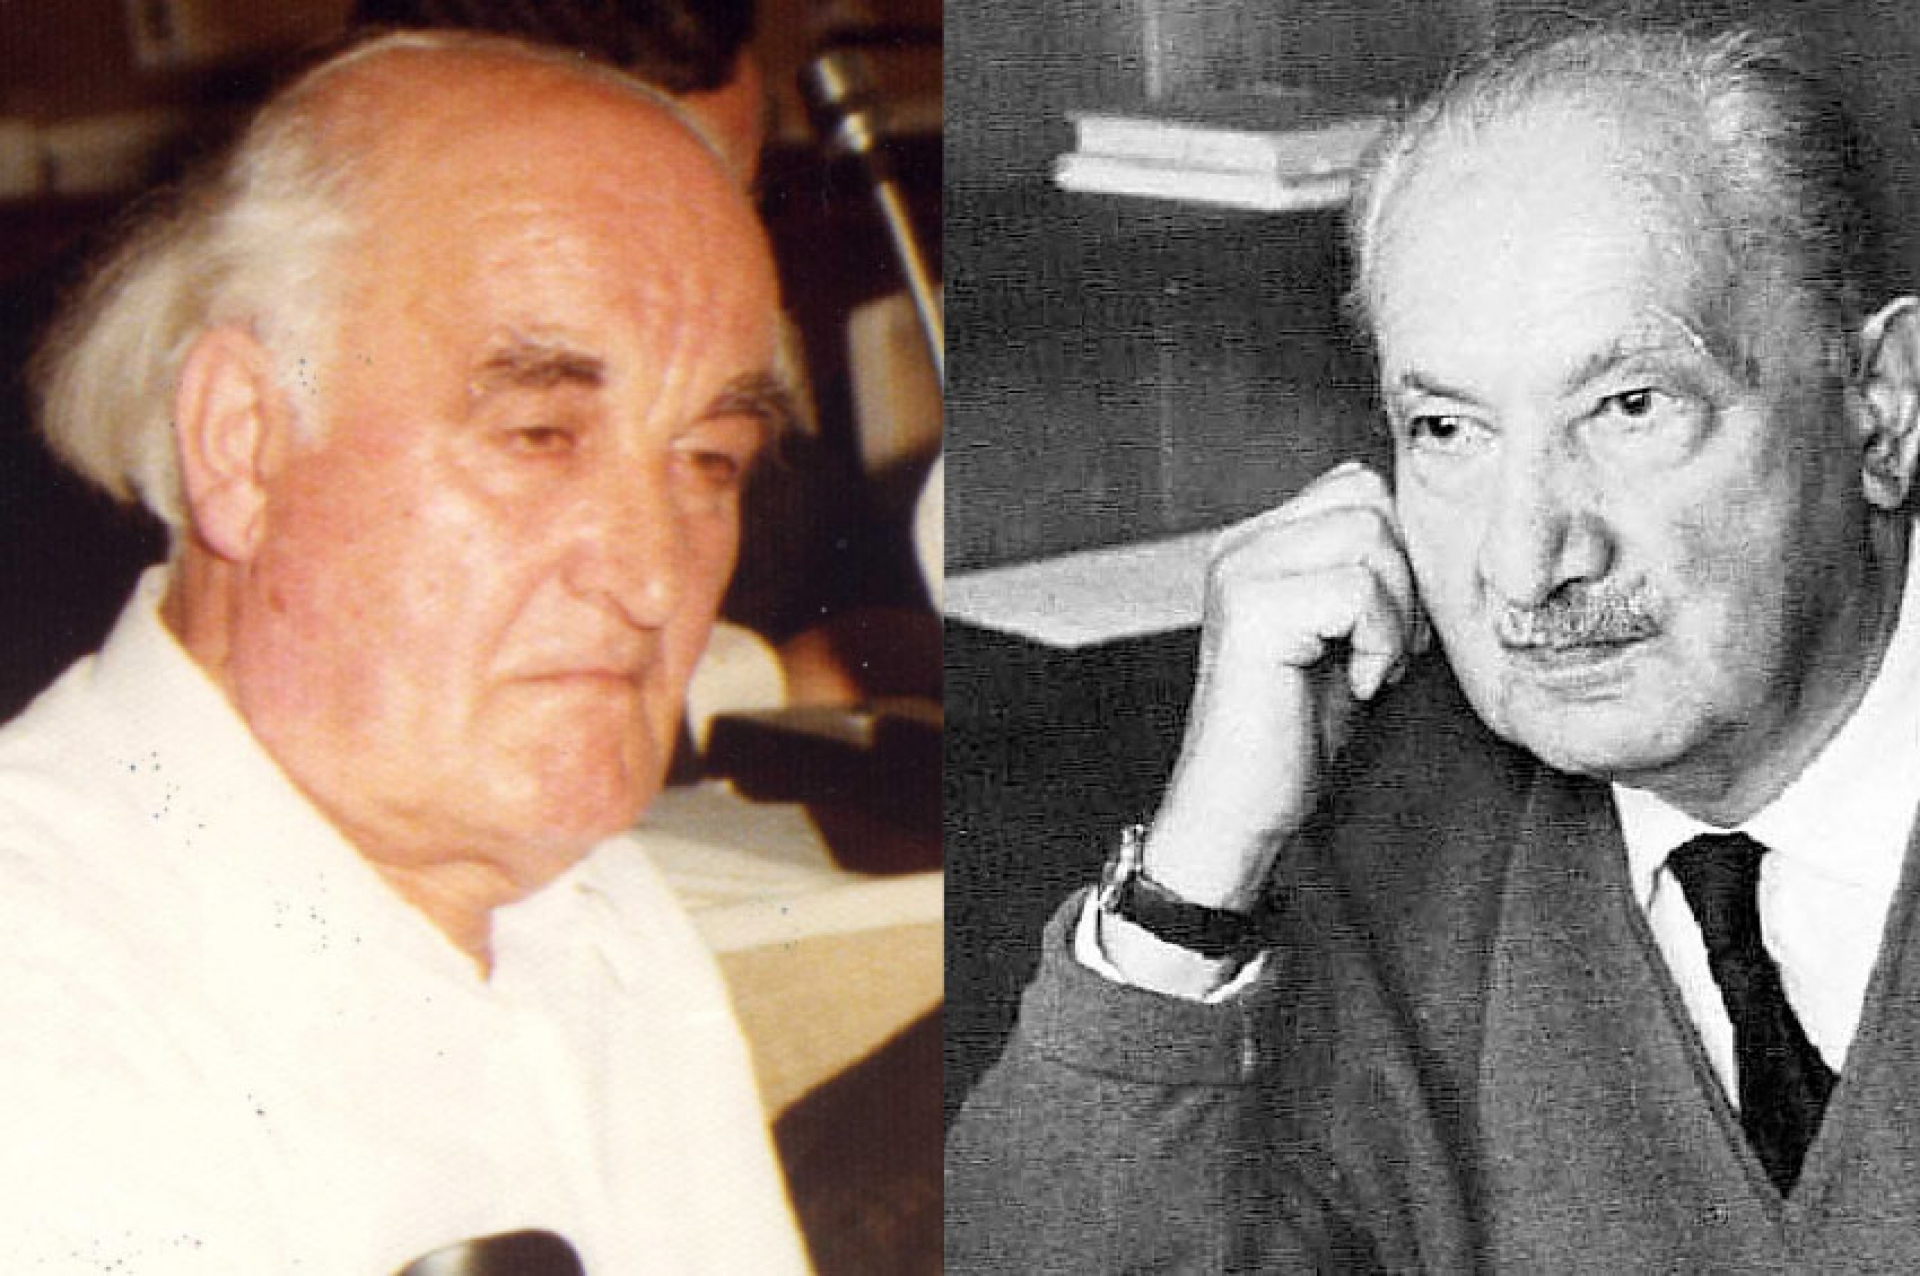 Prekopavanje historije - Đozo je bosanski Heidegger